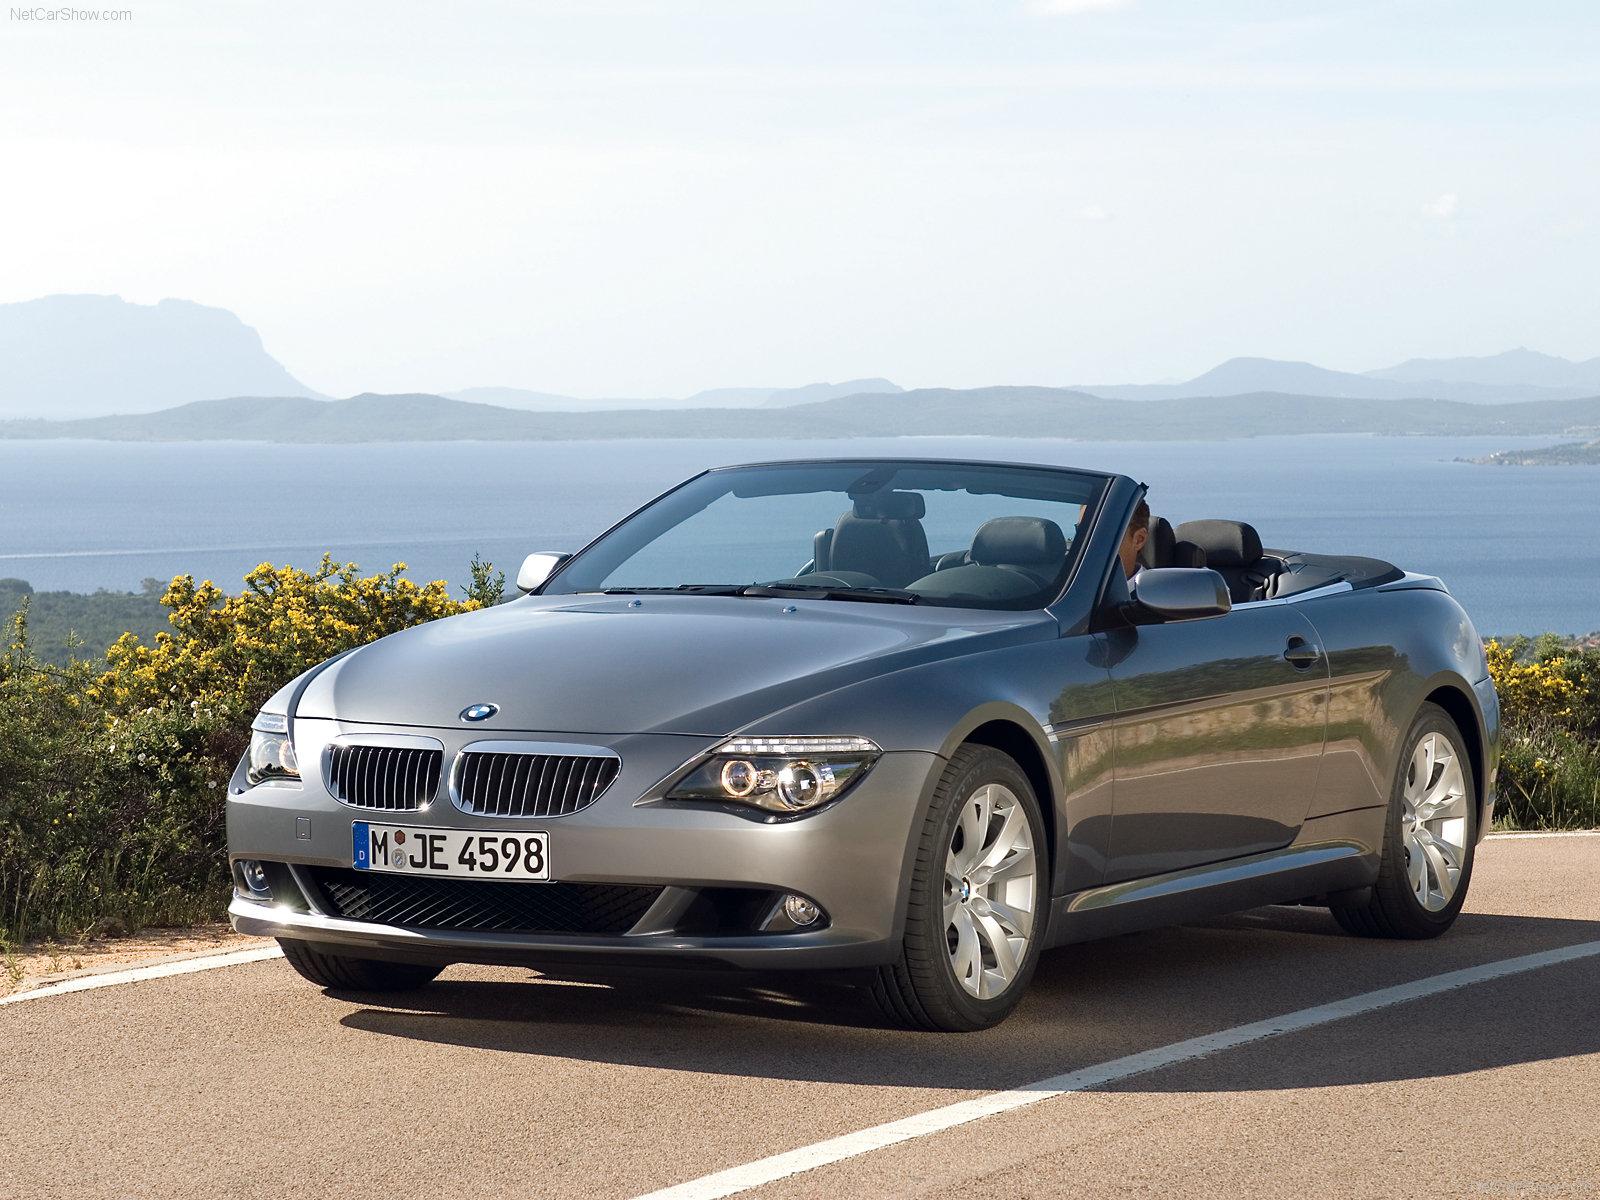 BMW 6-series E64 Convertible photo 45096